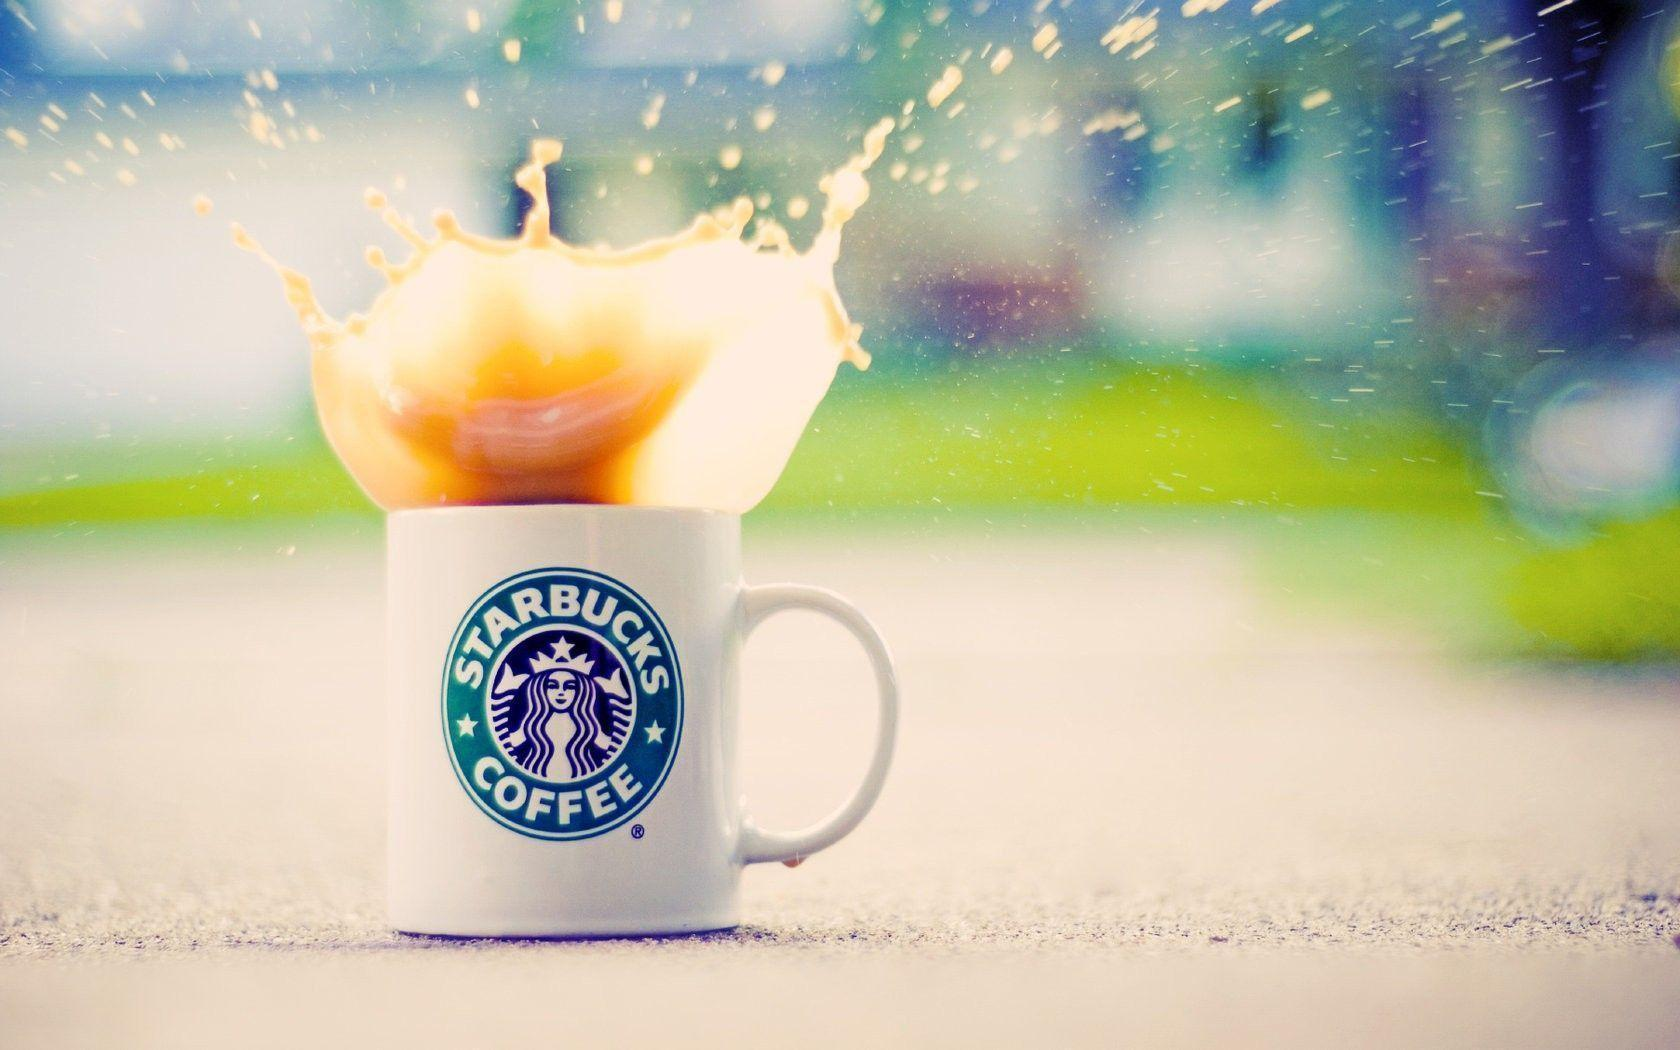 Starbucks Coffee HD Desktop Wallpaper #4275 #16057 Wallpaper | SpotIMG